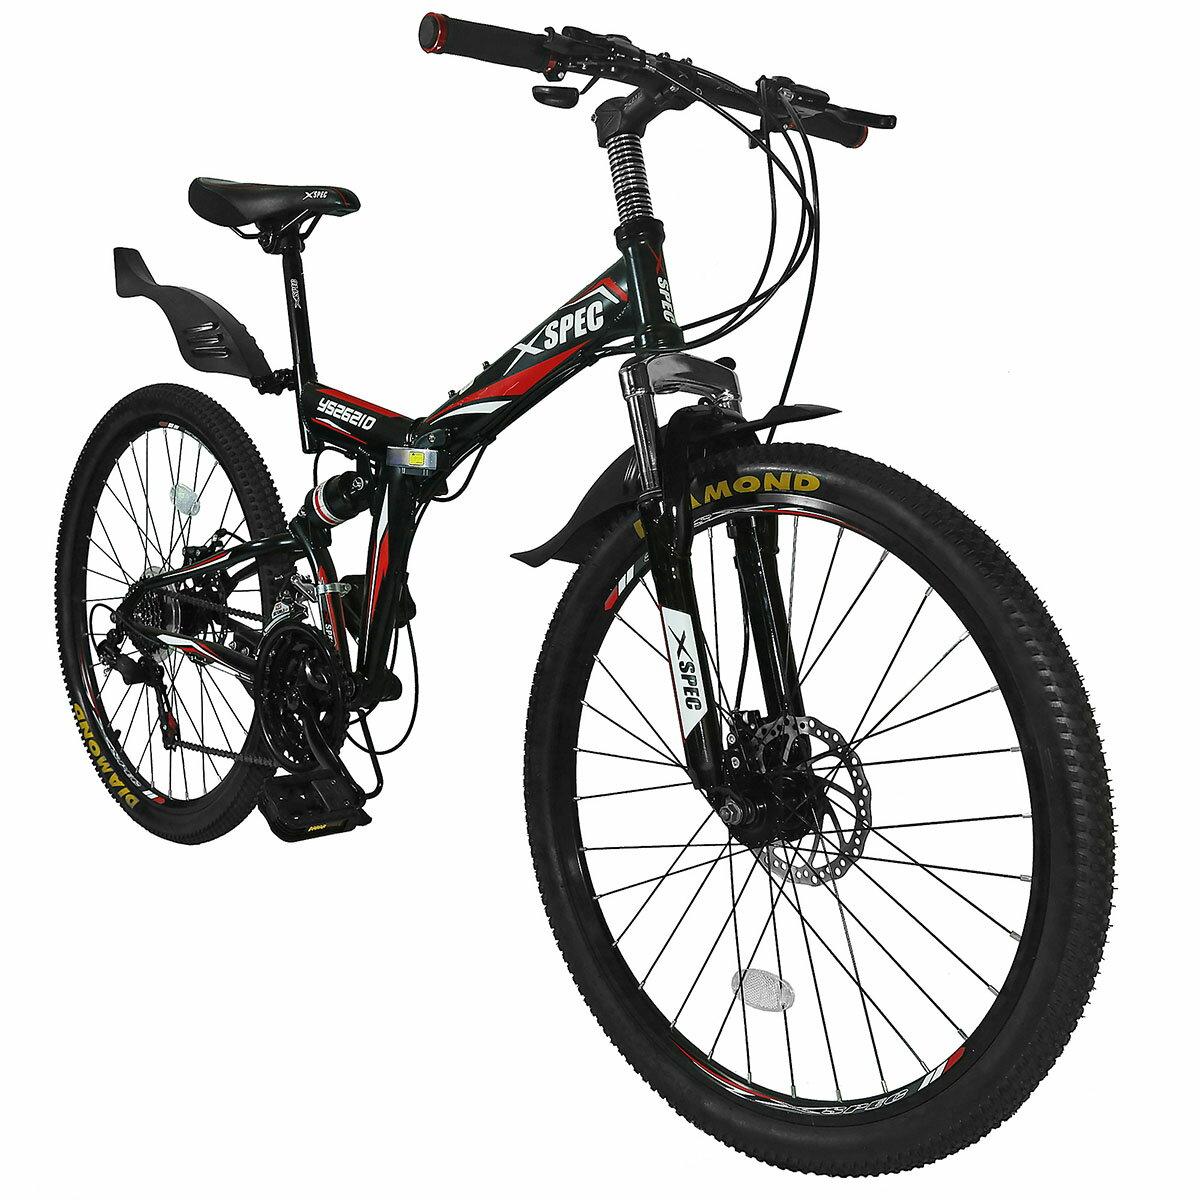 "Xspec 26"" 21 Speed Folding Mountain Bike Bicycle Trail Commuter Shimano Black 0"